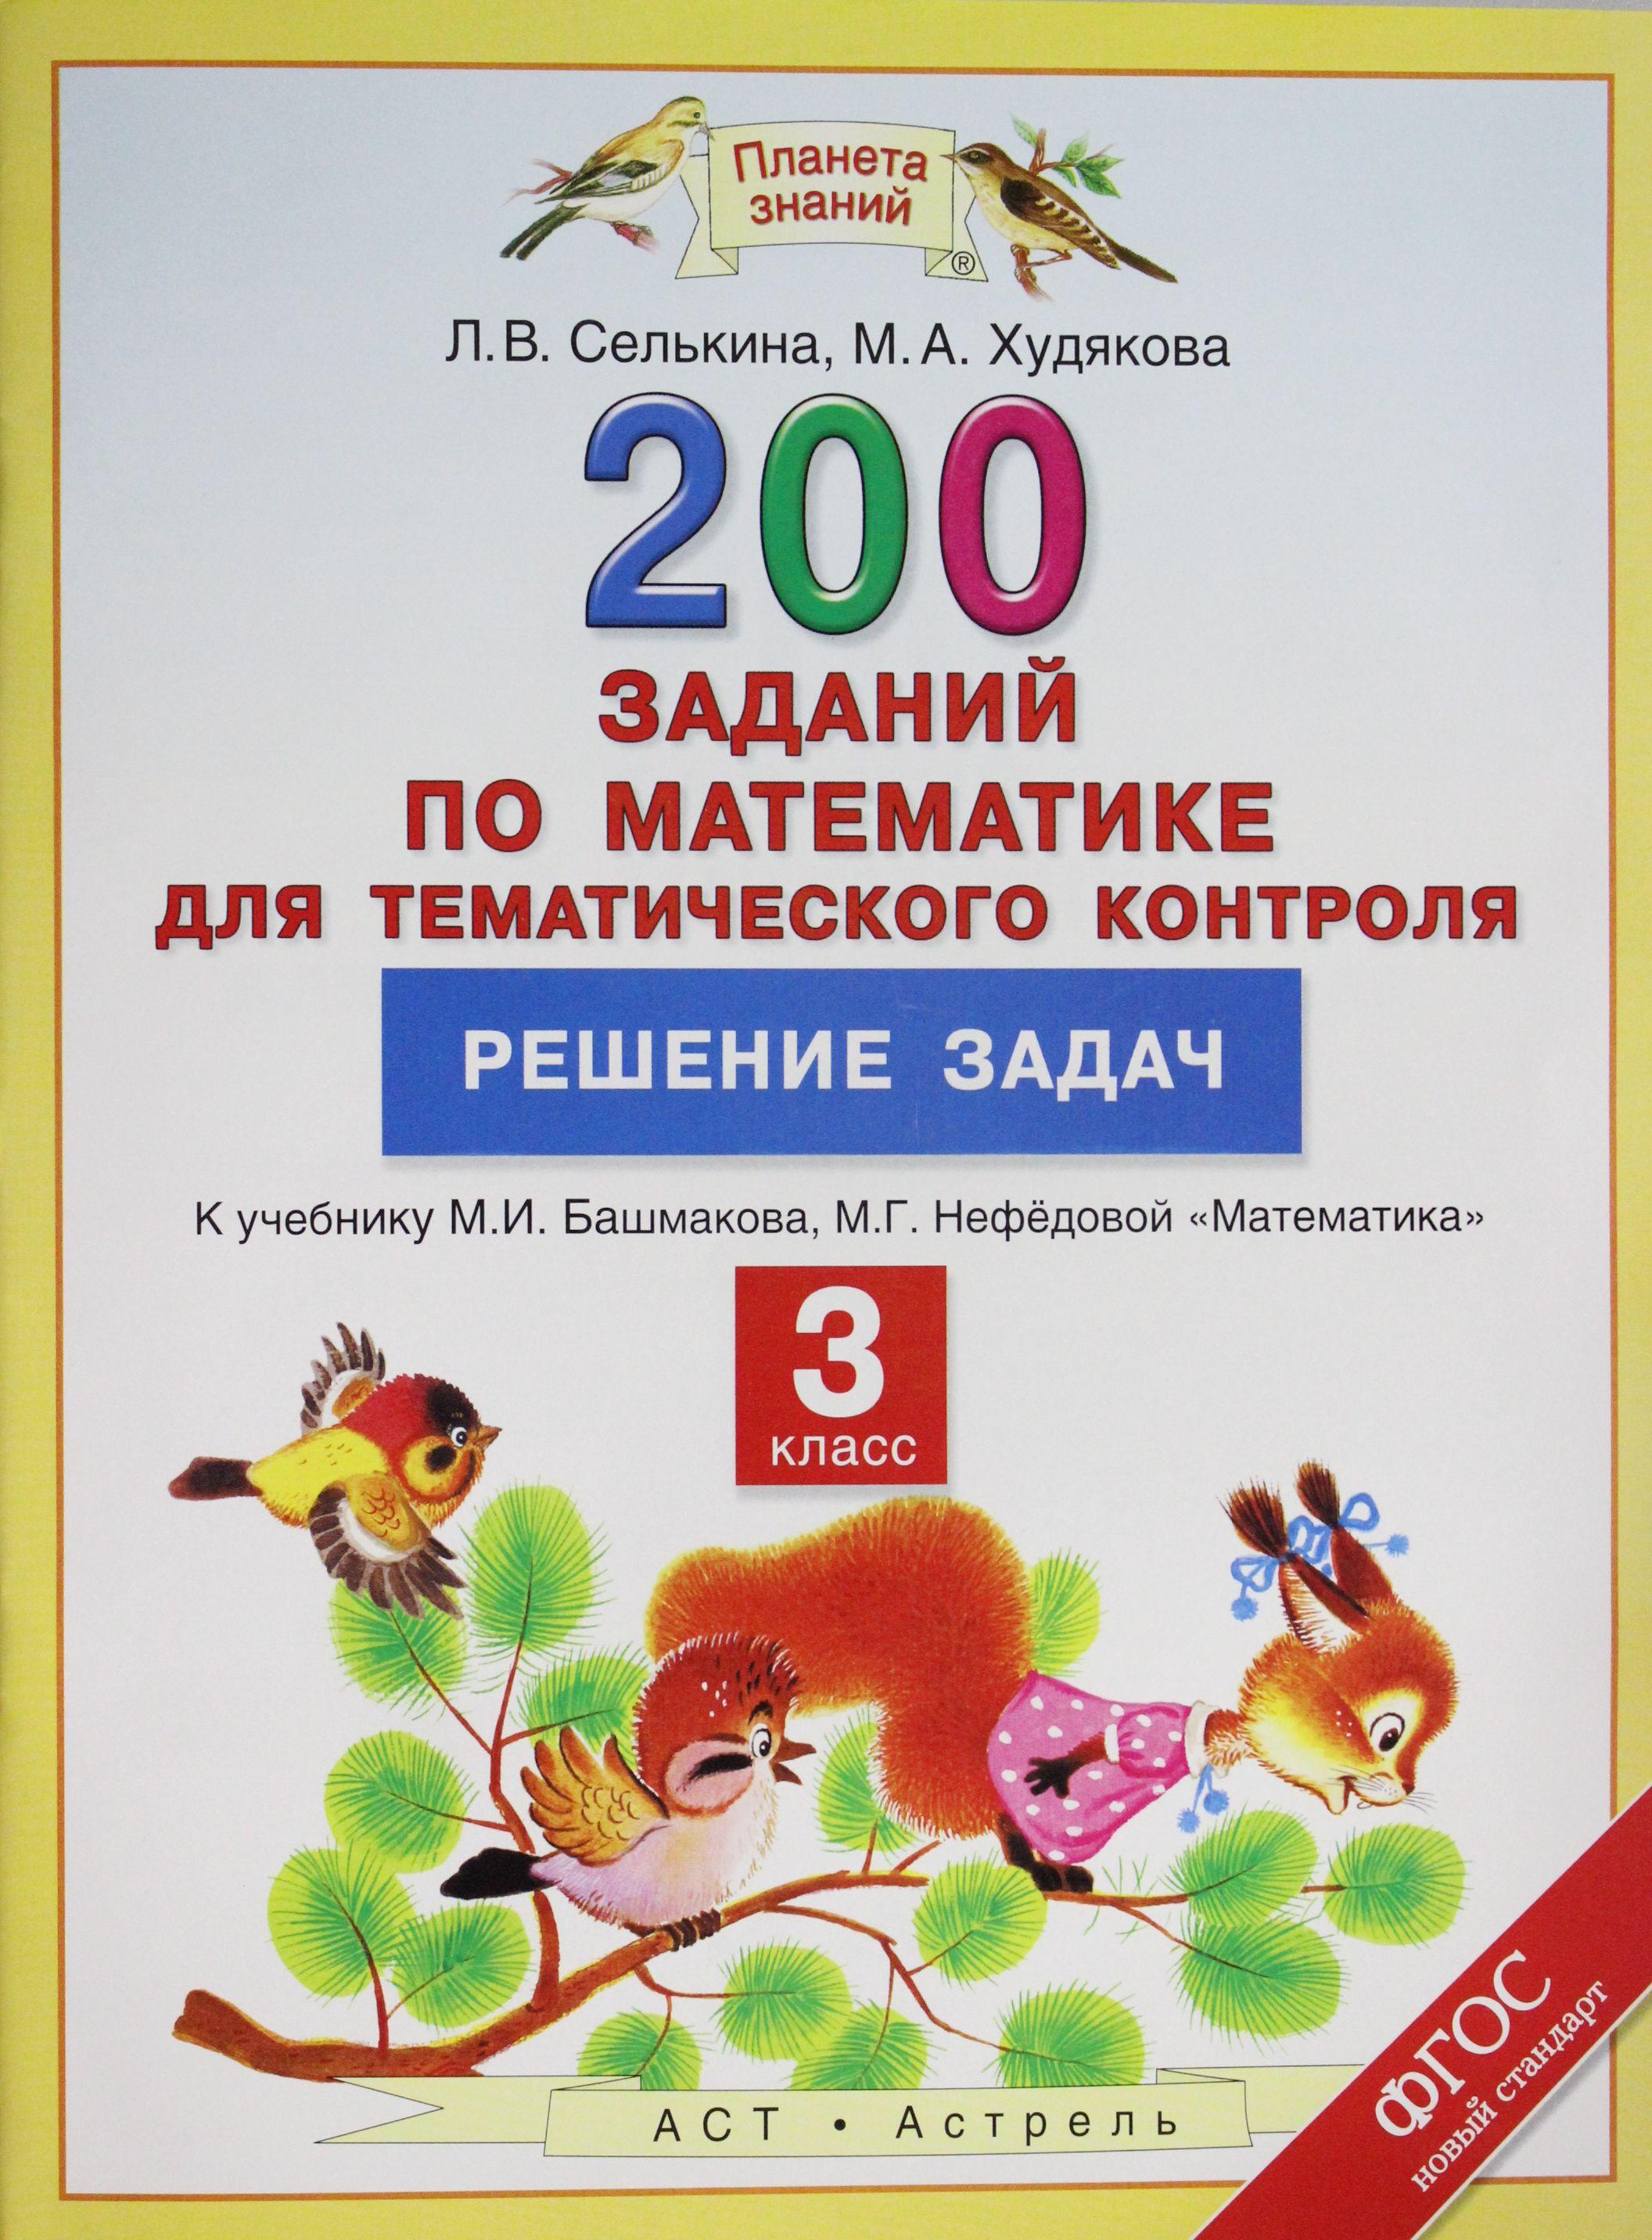 Matematika. 3 klass. 200 zadanij po matematike dlja tematicheskogo kontrolja. Reshenie zadach